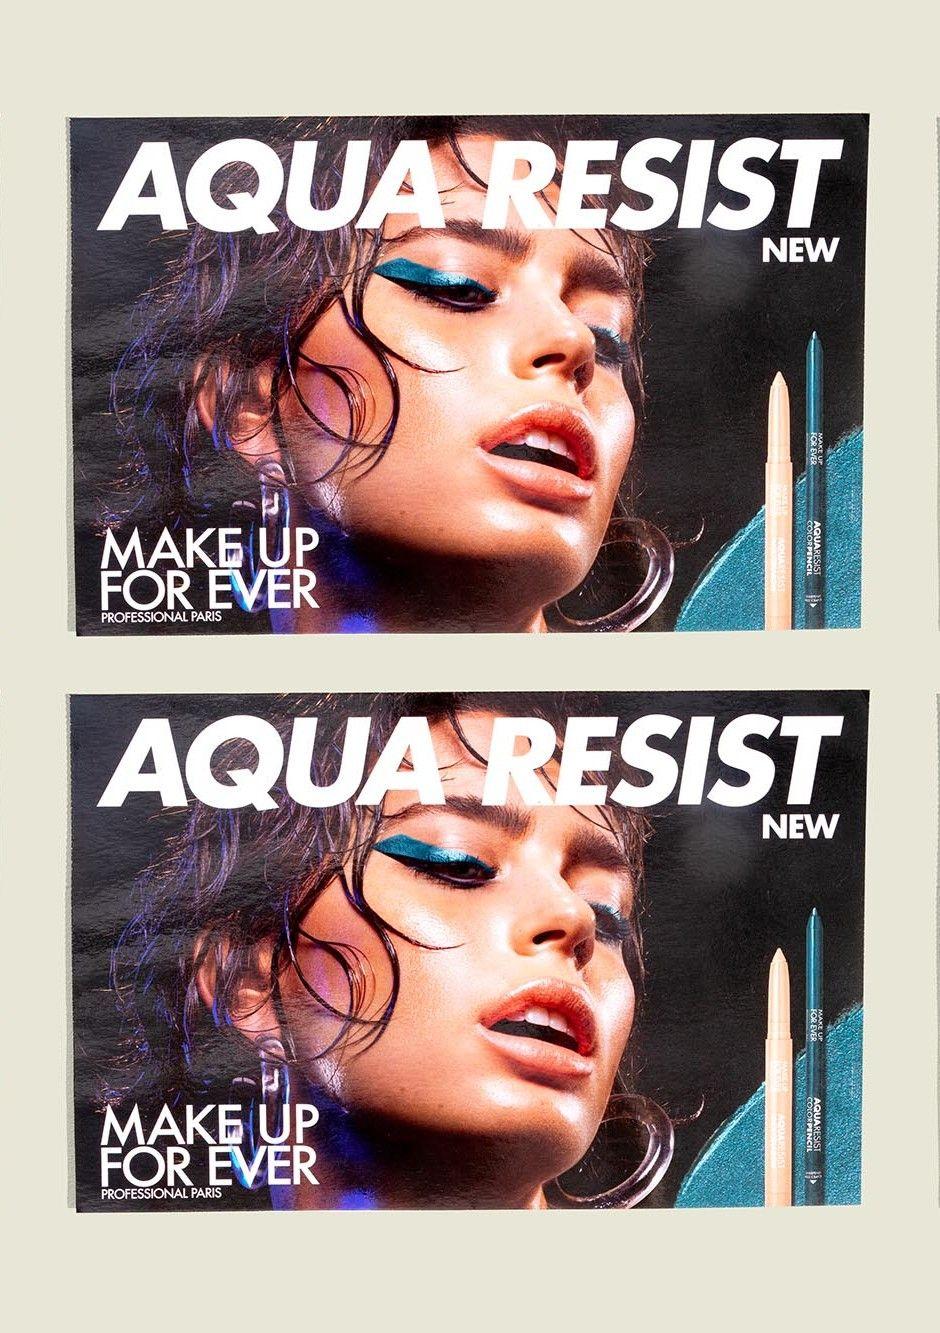 Custom printed posters